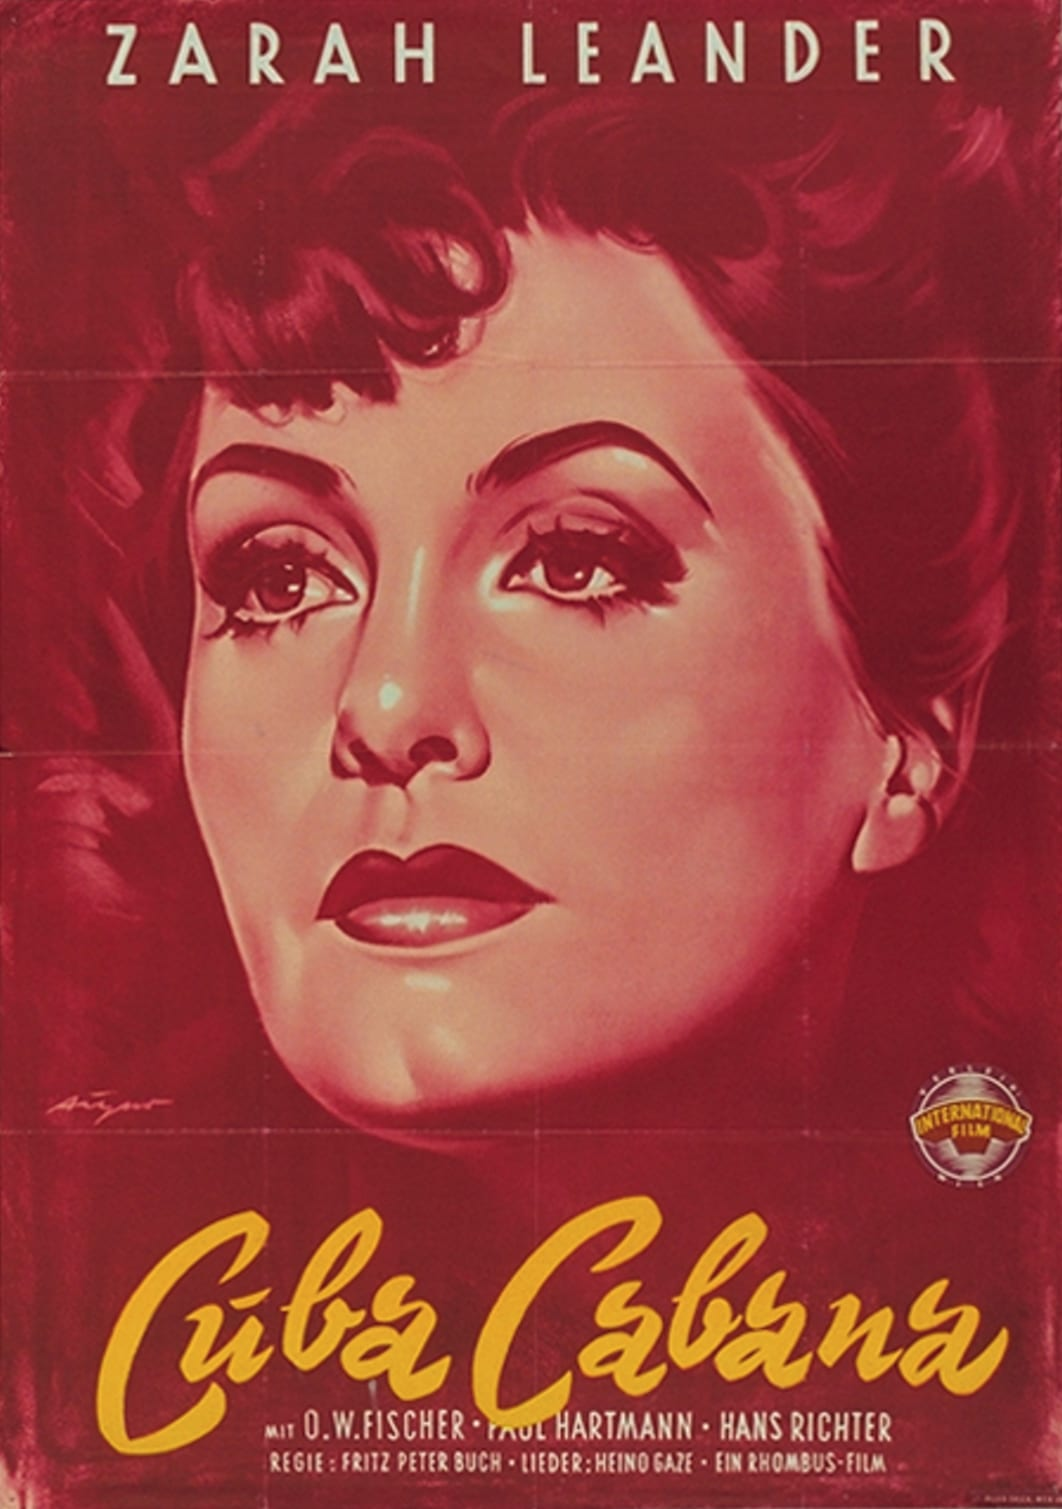 Cuba Cabana (1952)